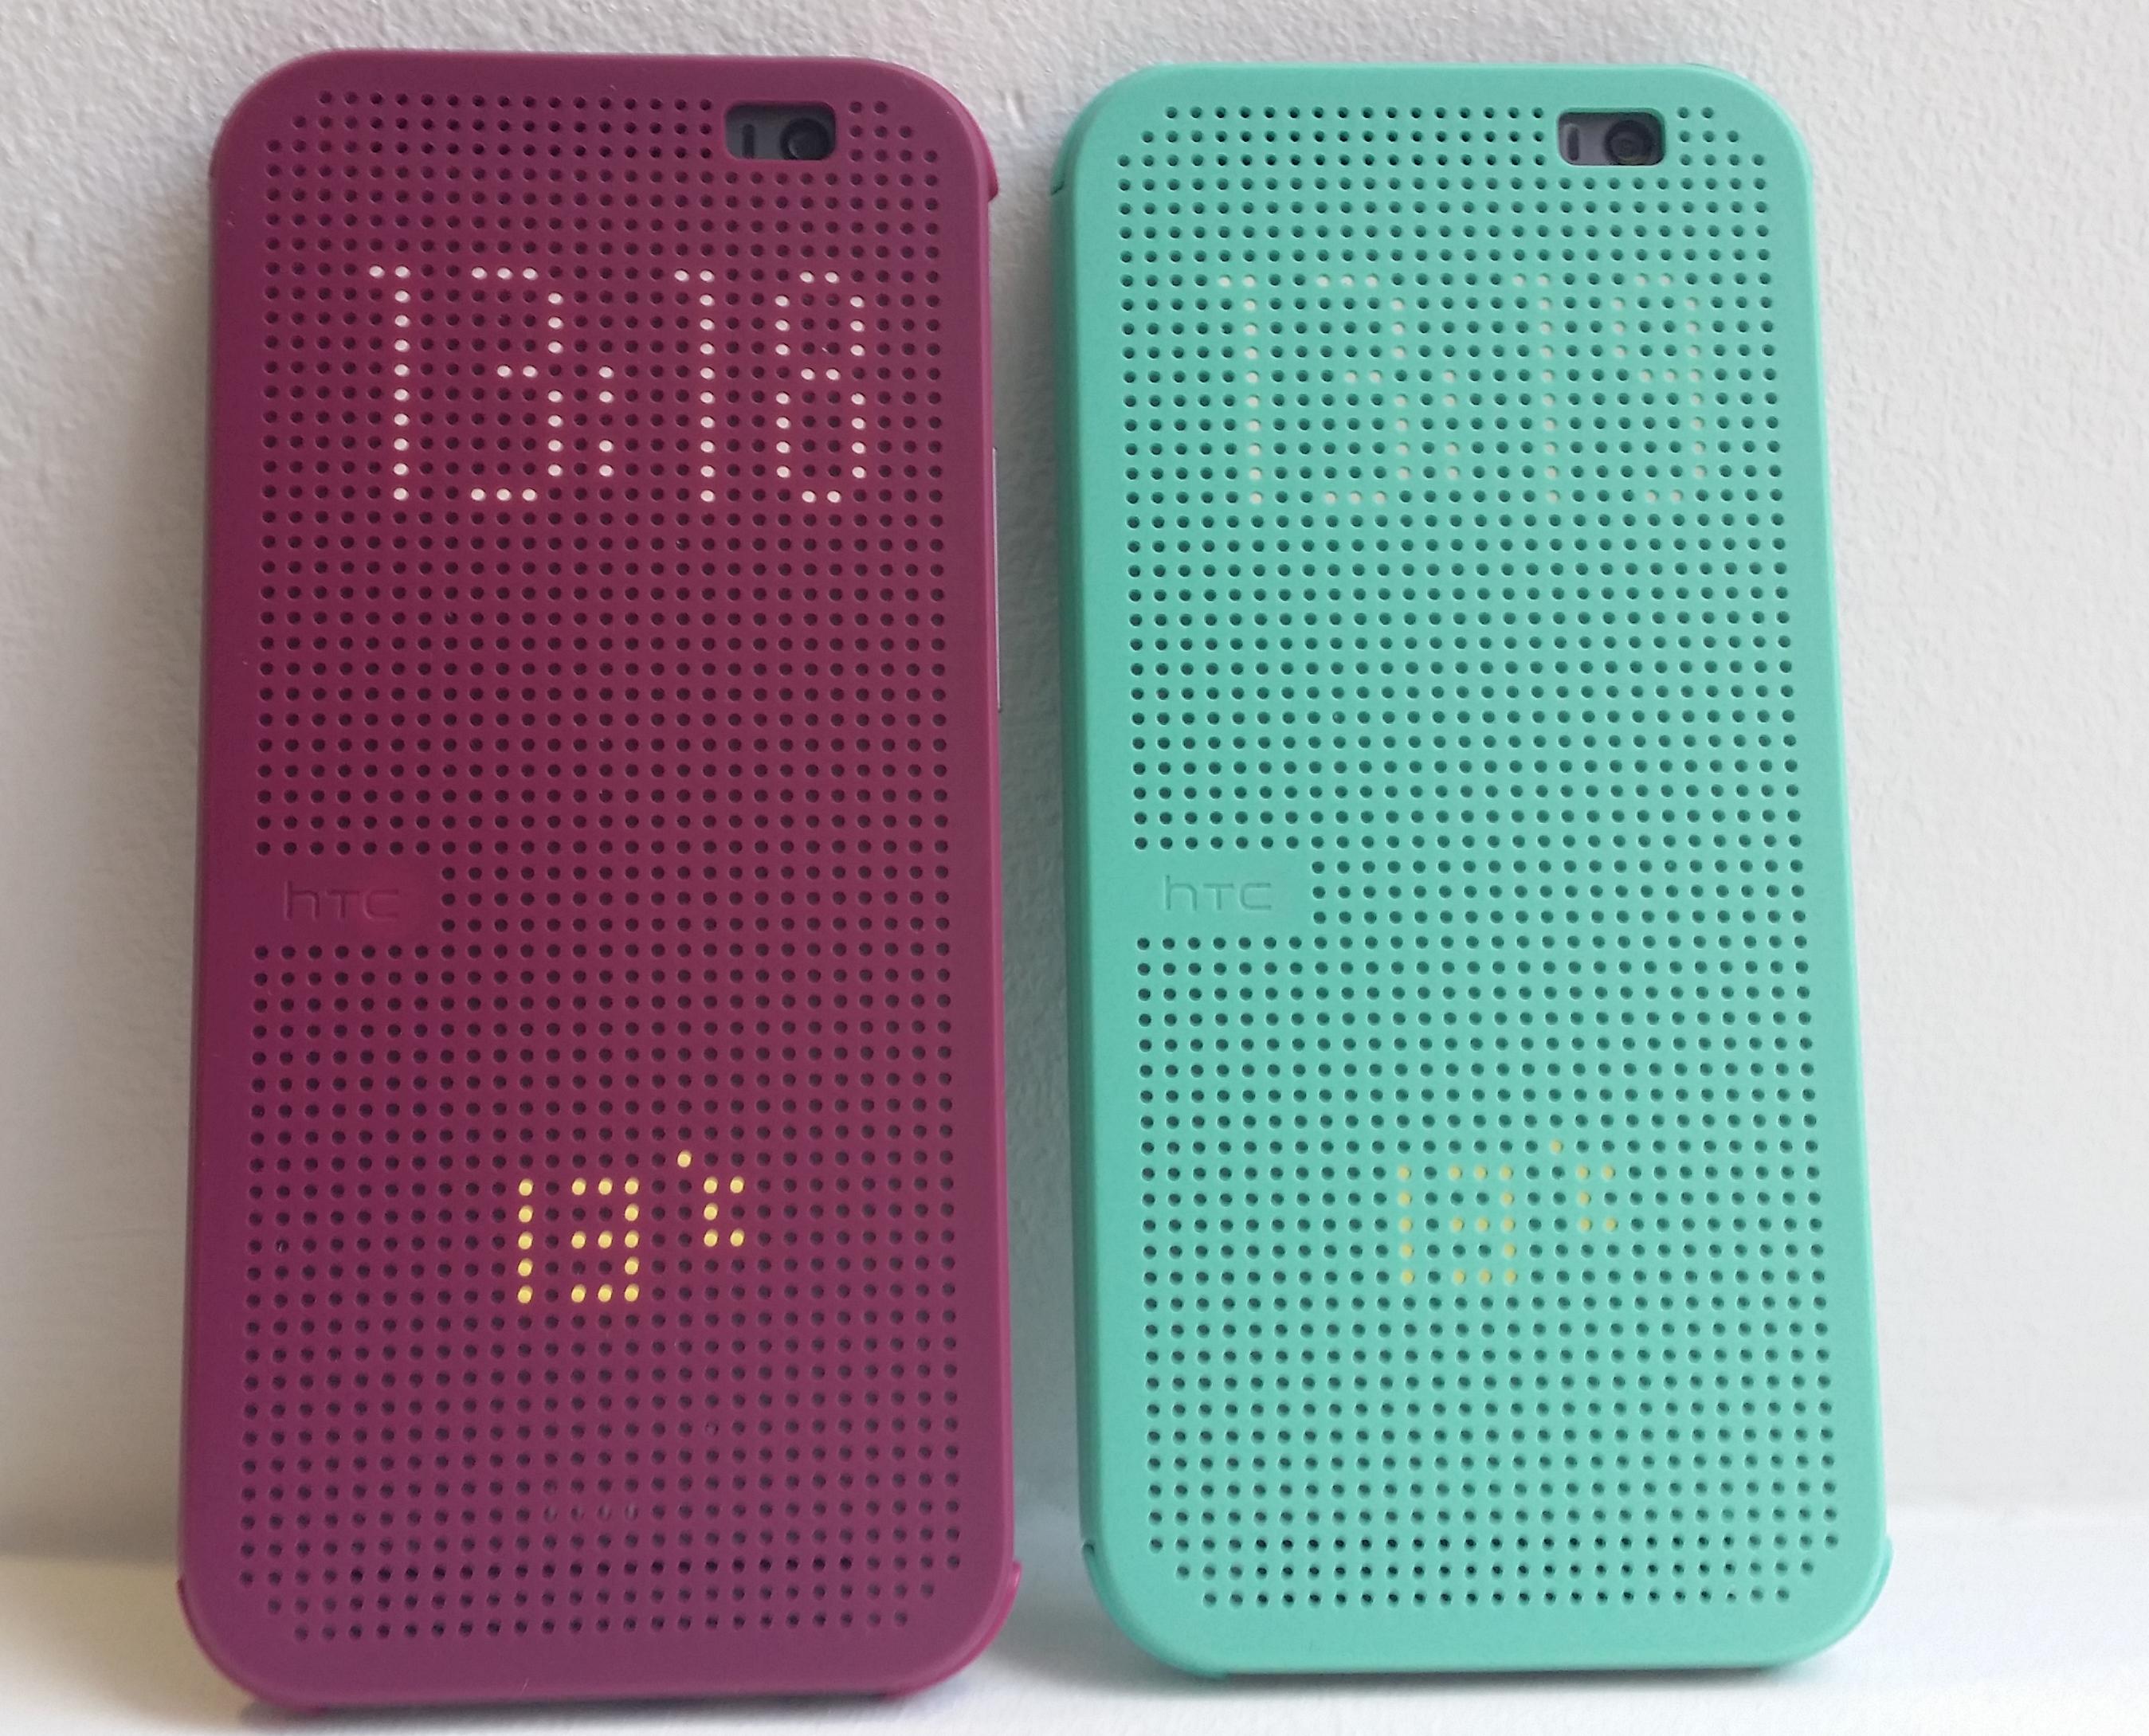 Htc One m8 Purple Tint Htc_one_m8__cases